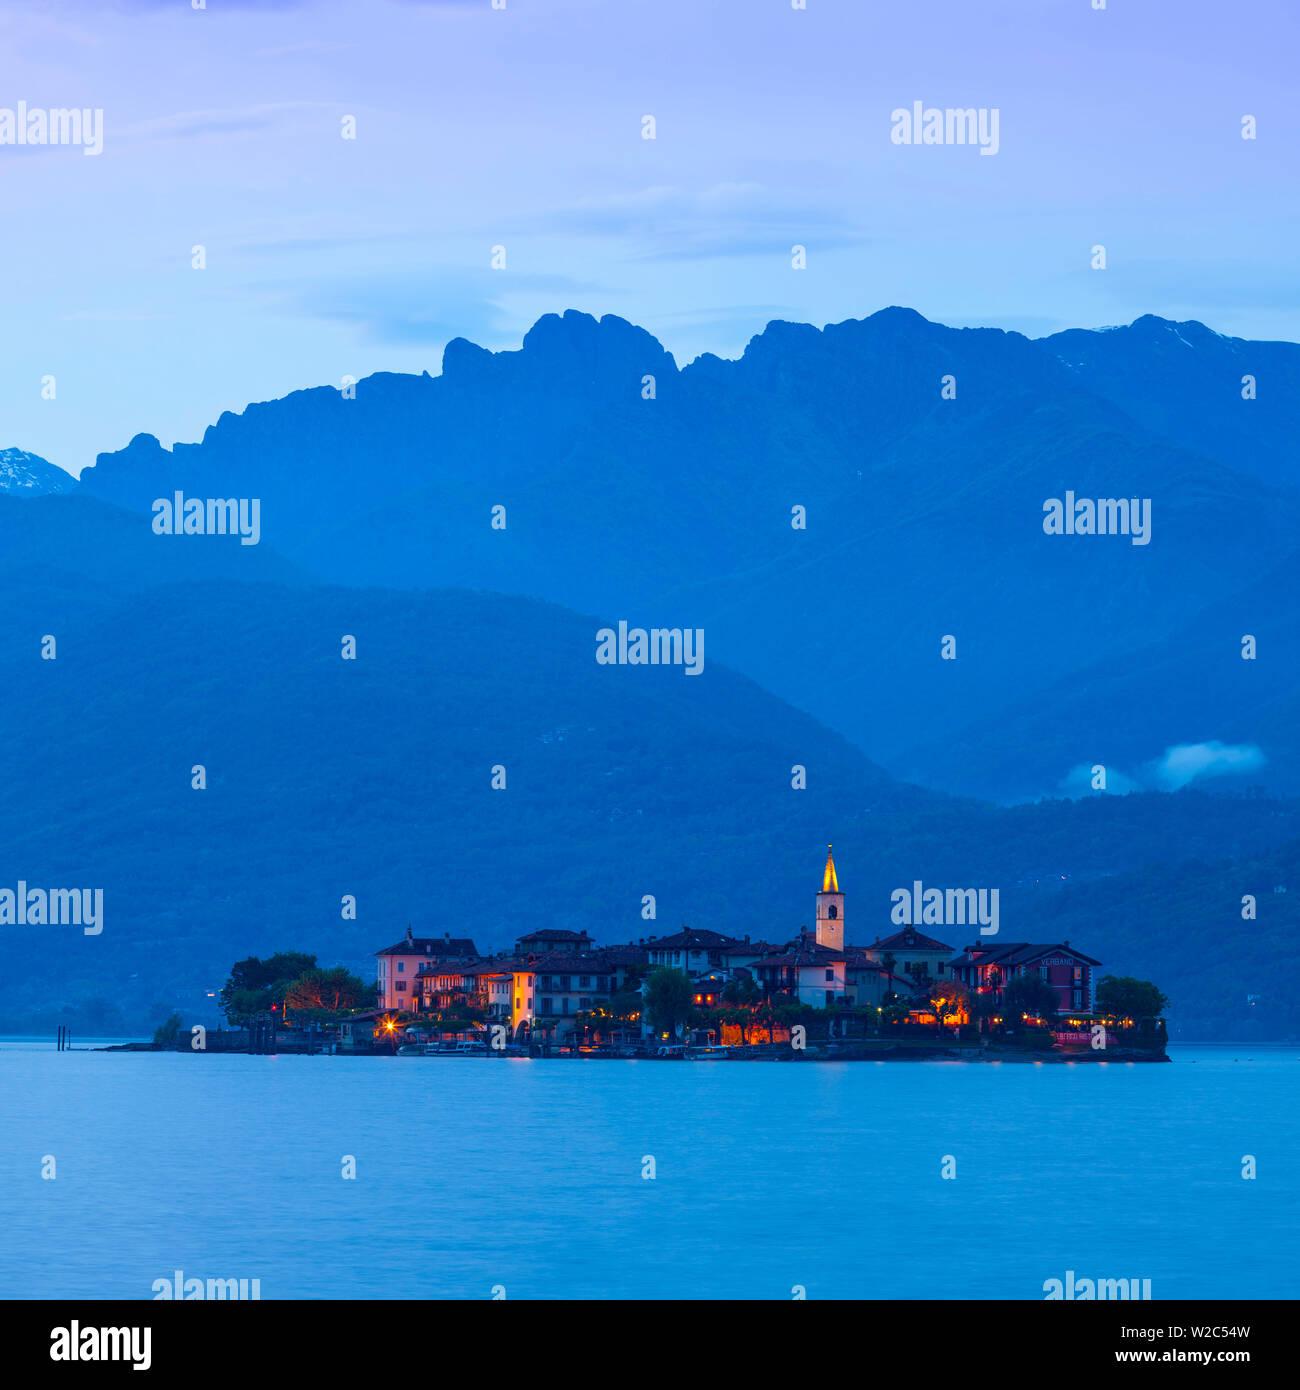 Isola dei Pescatori  (Fishermen's Islands) illuminated at dusk, Borromean Islands, Lake Maggiore, Piedmont, Italy - Stock Image